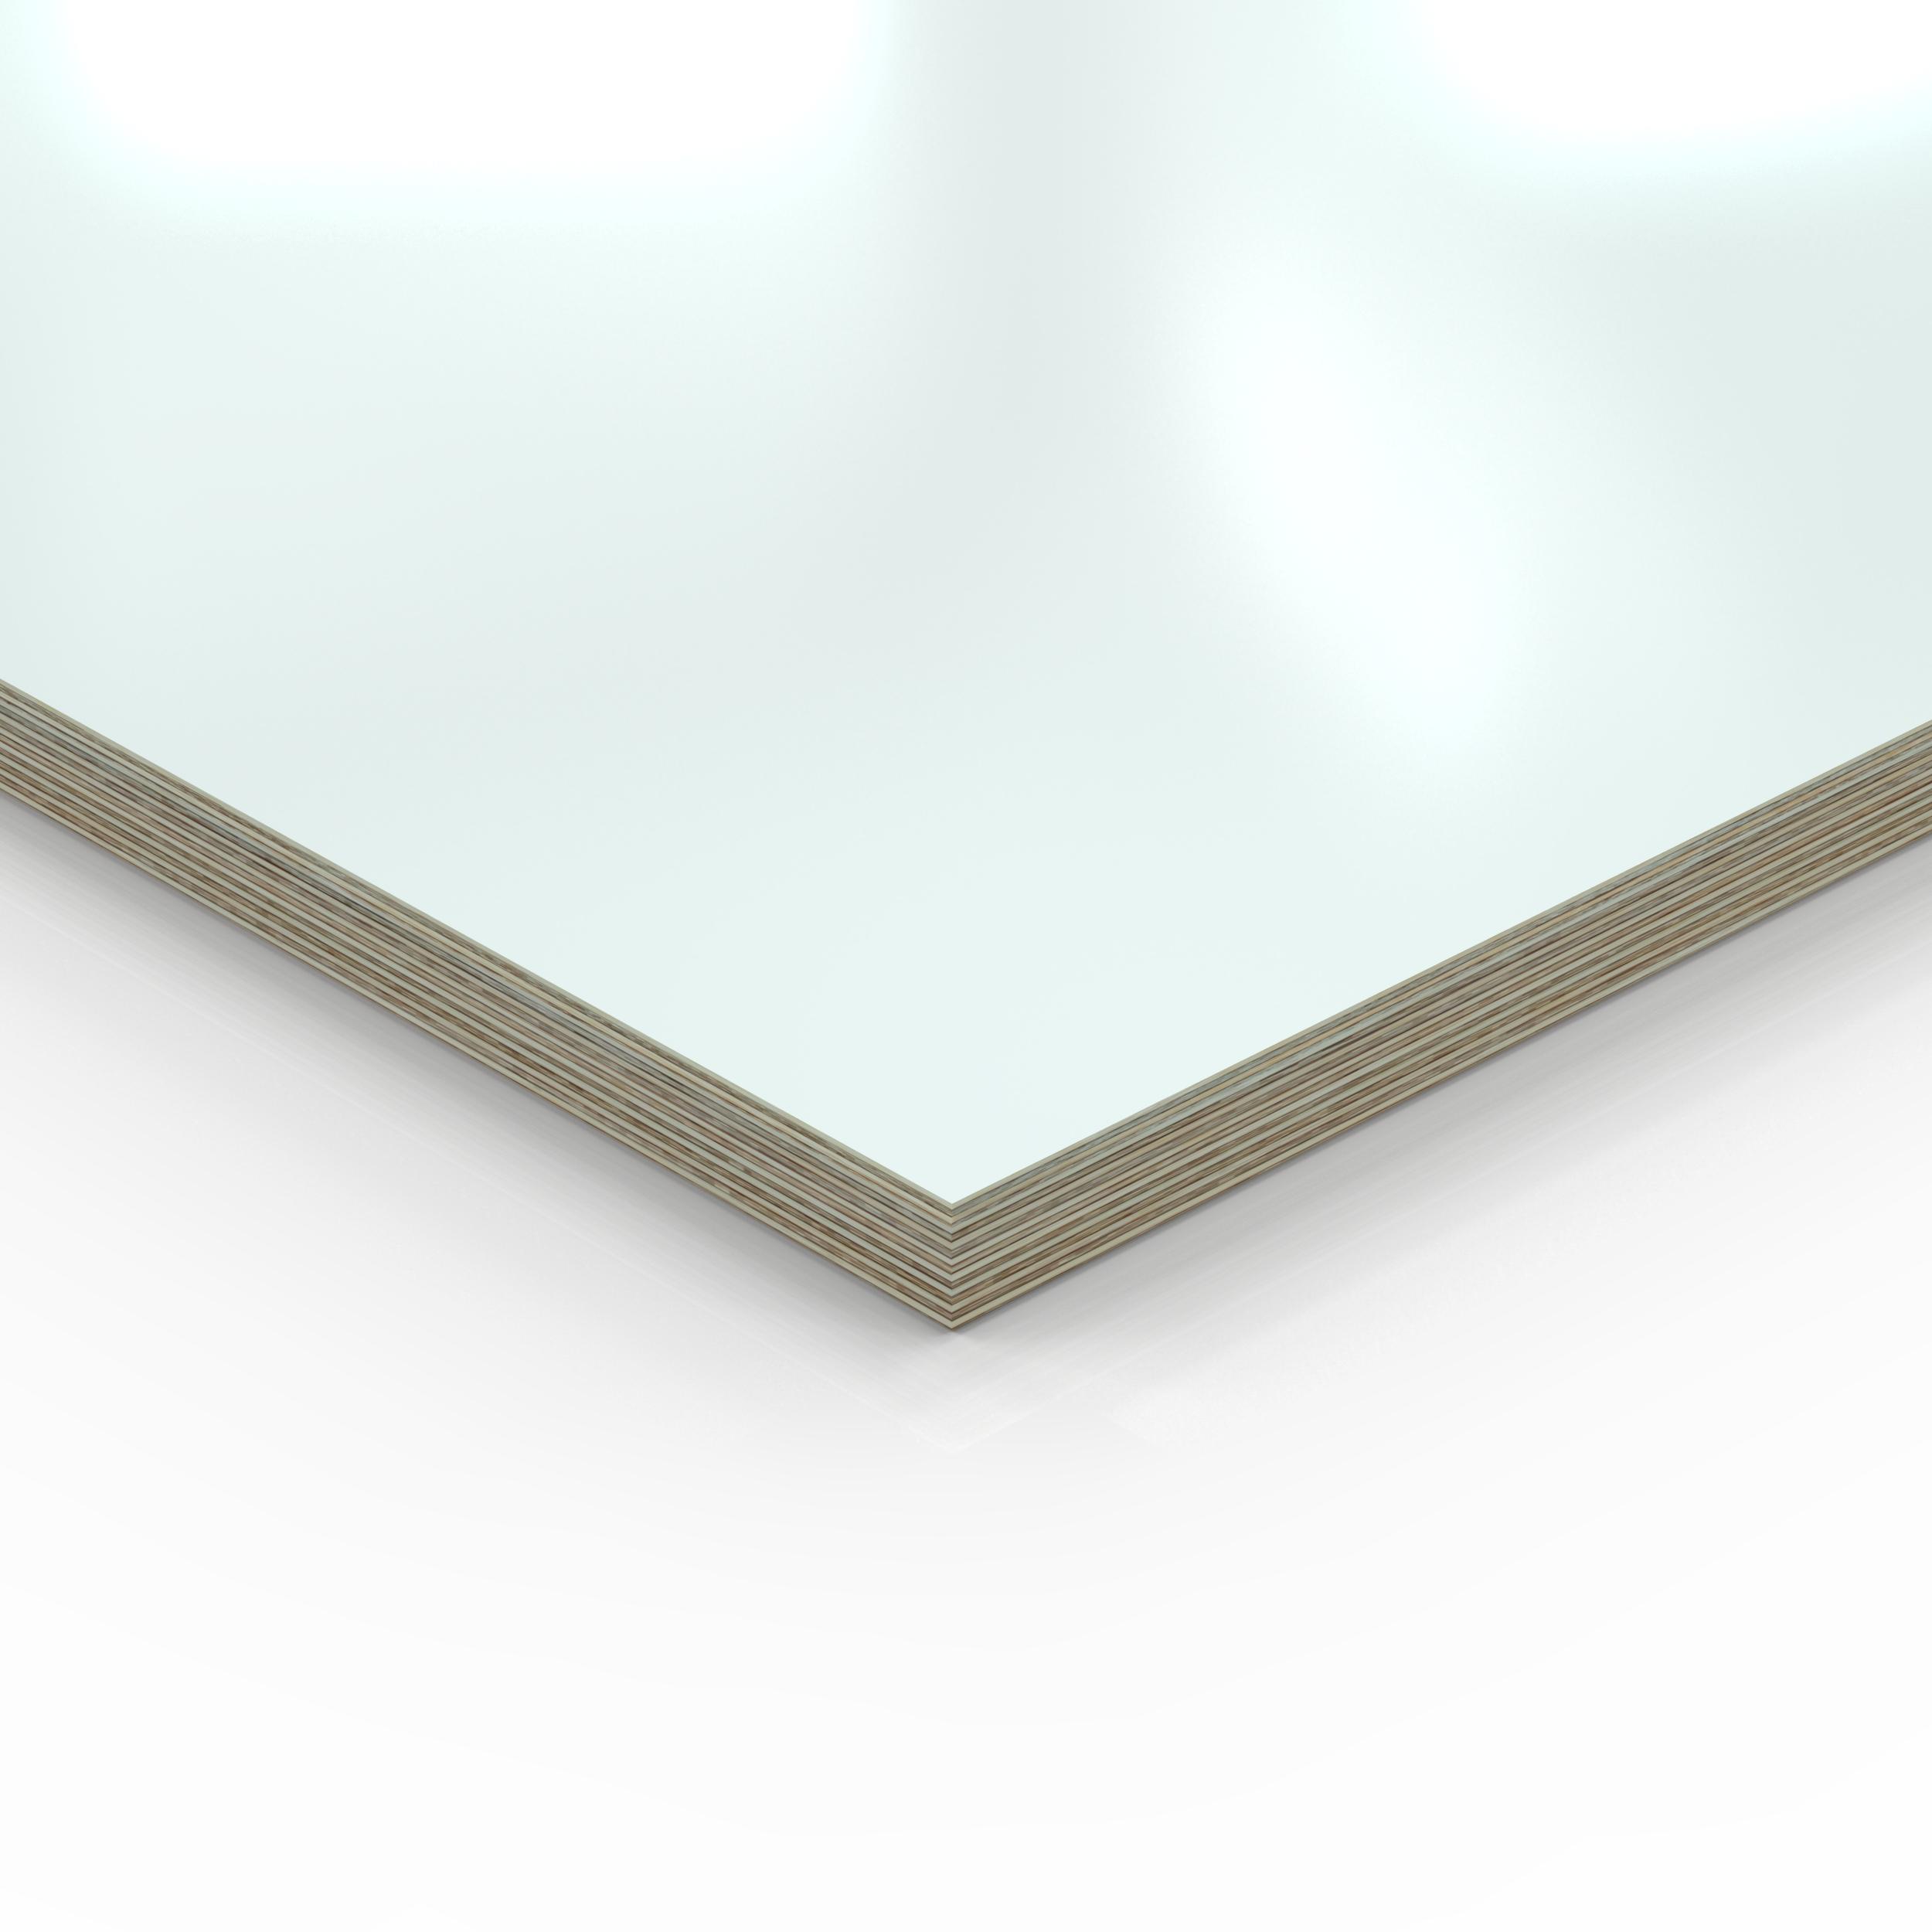 15mm Multiplex Zuschnitt wei/ß melaminbeschichtet L/änge bis 200cm Multiplexplatten Zuschnitte Auswahl 80x100 cm